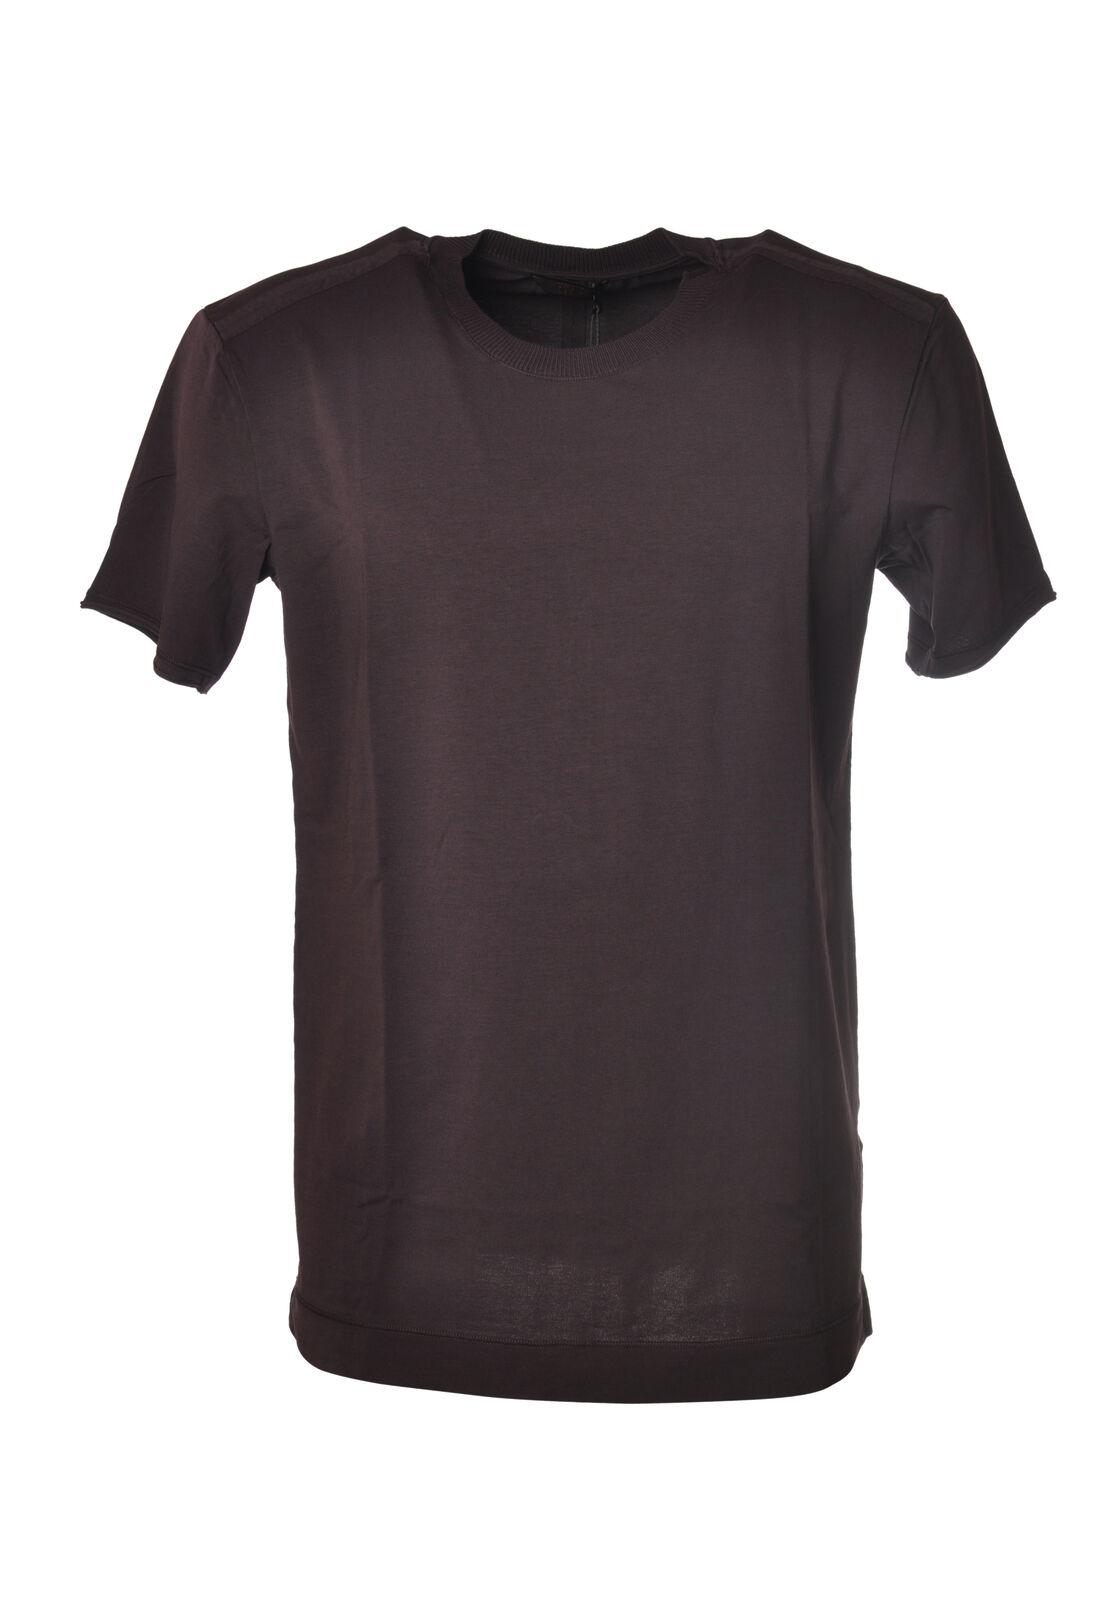 Hosio - Topwear-T-shirts - Man - Braun - 5823212M185057